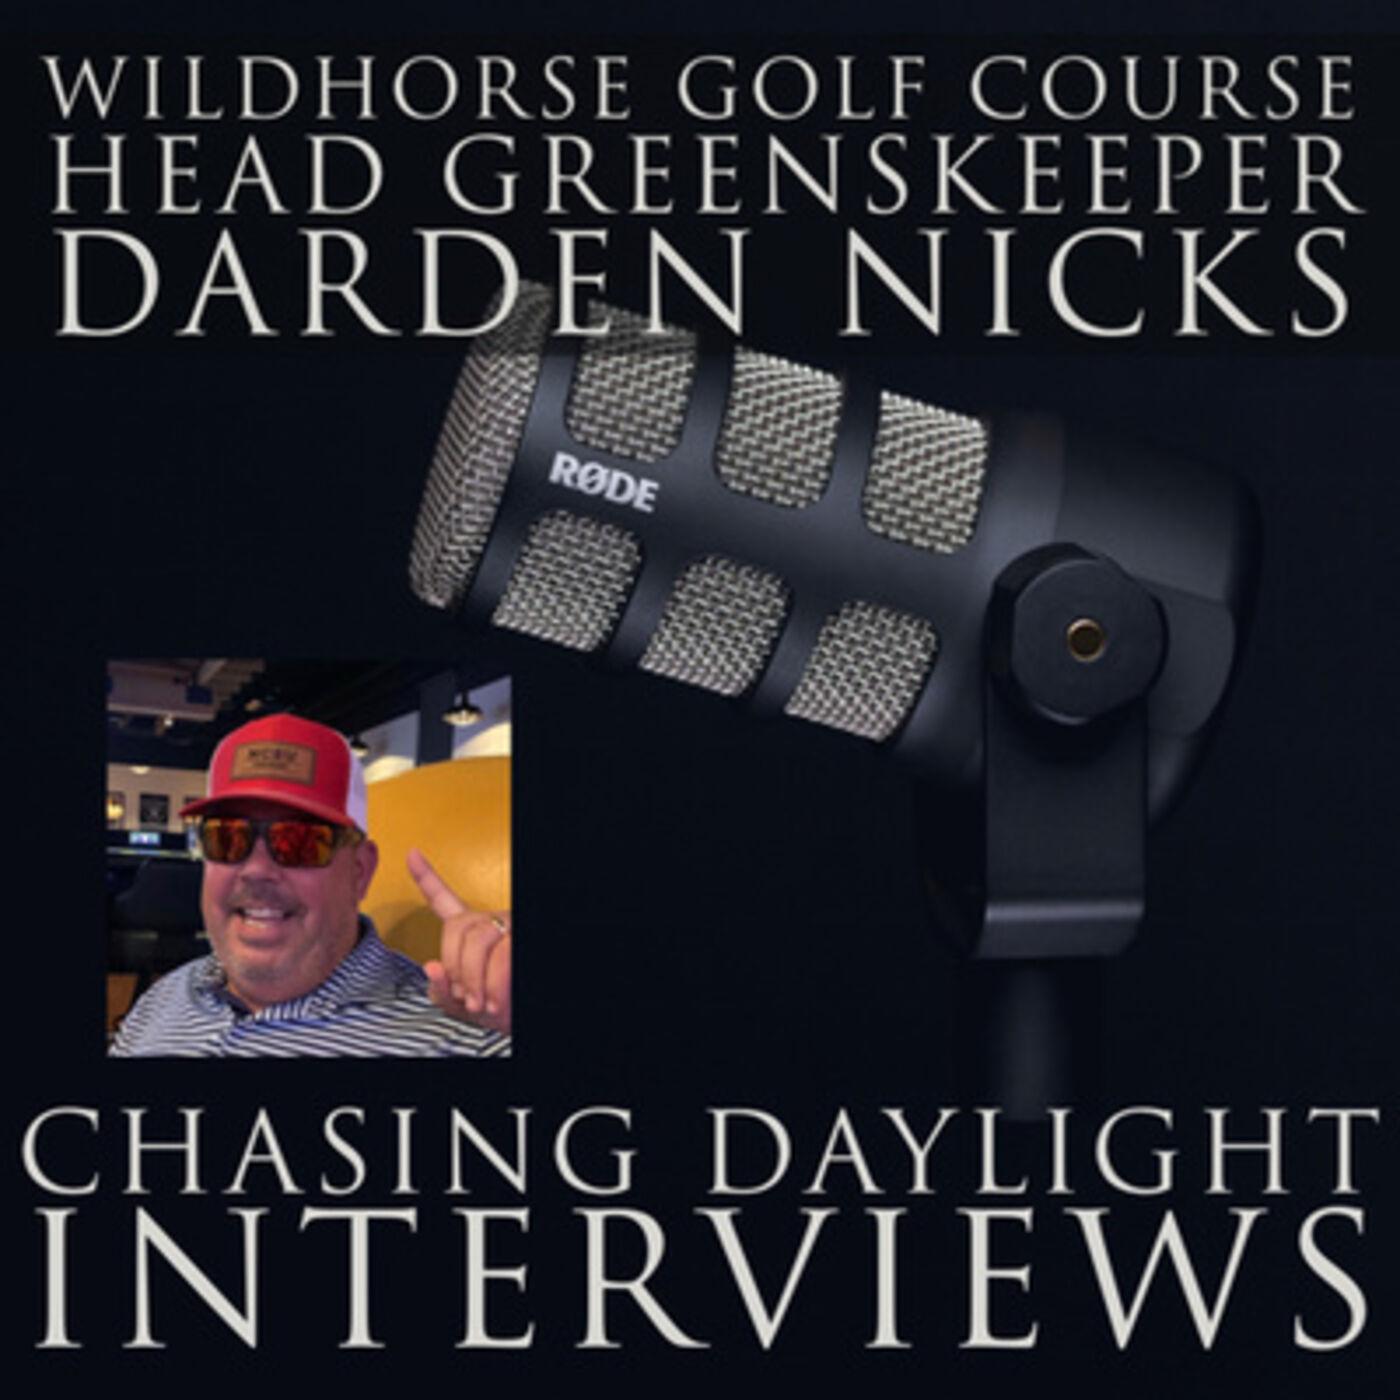 E117: Darden Nicks, Director of Agronomy at Wildhorse GC